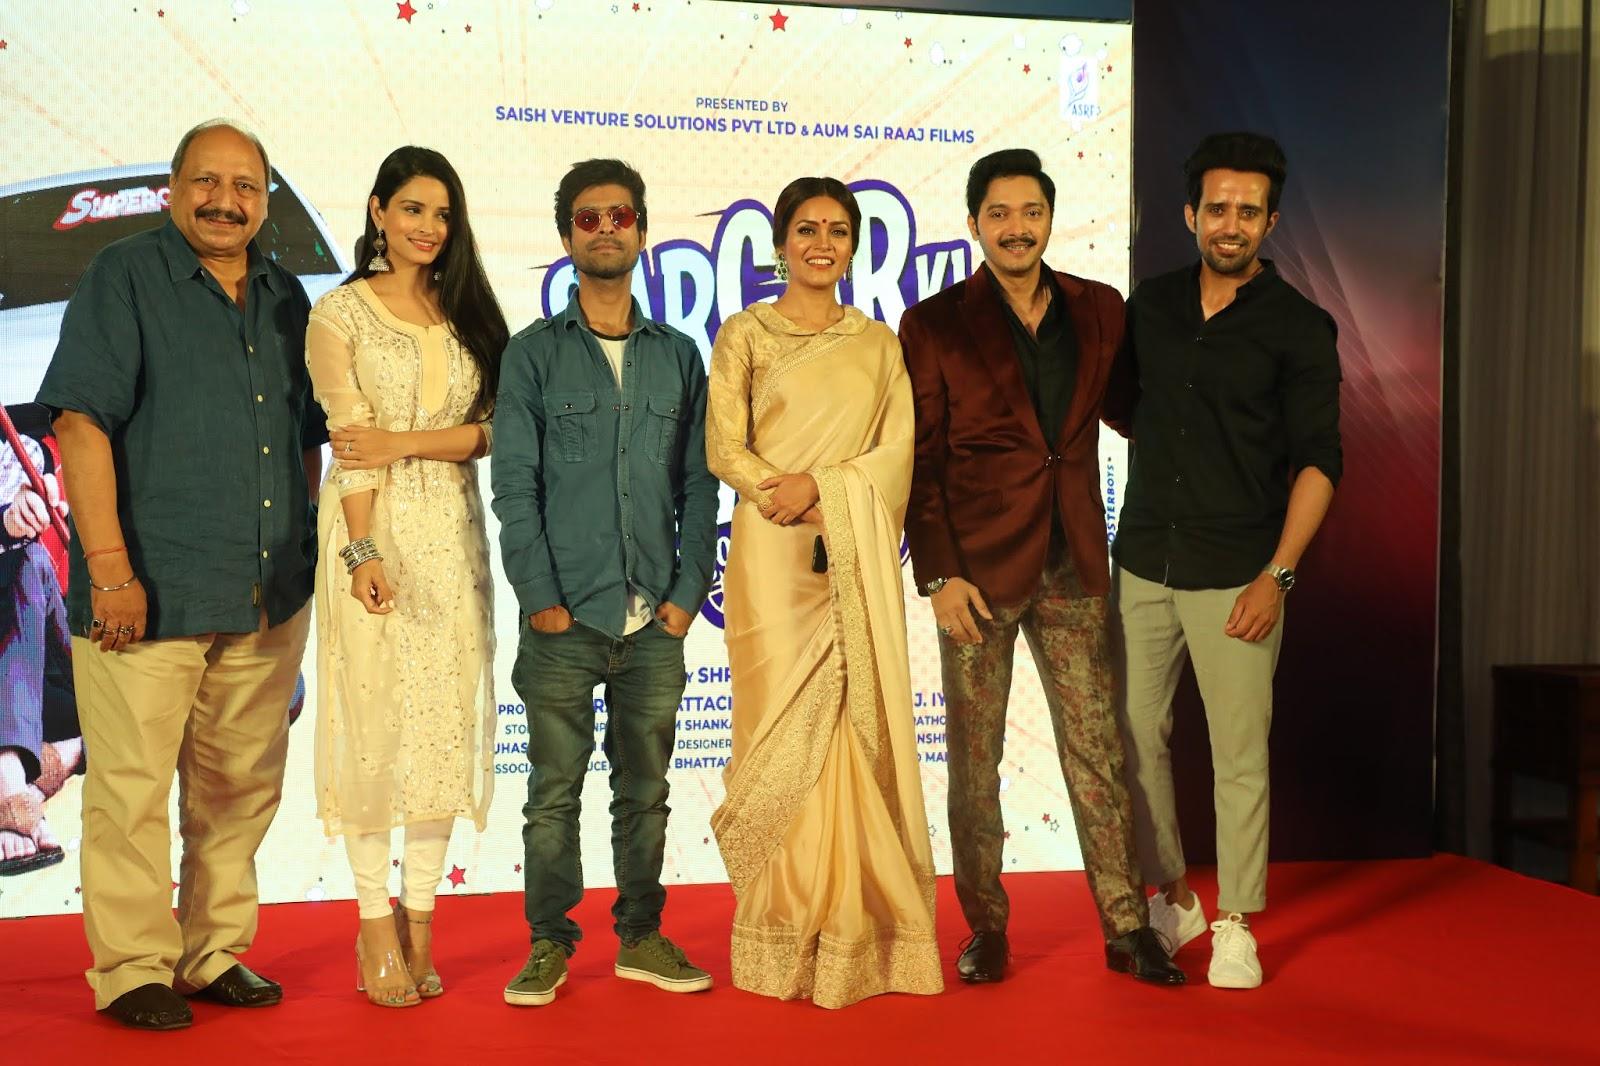 Mumbai News Network Latest News: Shreyas Talpade's Next Directorial Venture To Be A Socio-Family Laugh Riot 'SarCAR Ki Seva Mei'